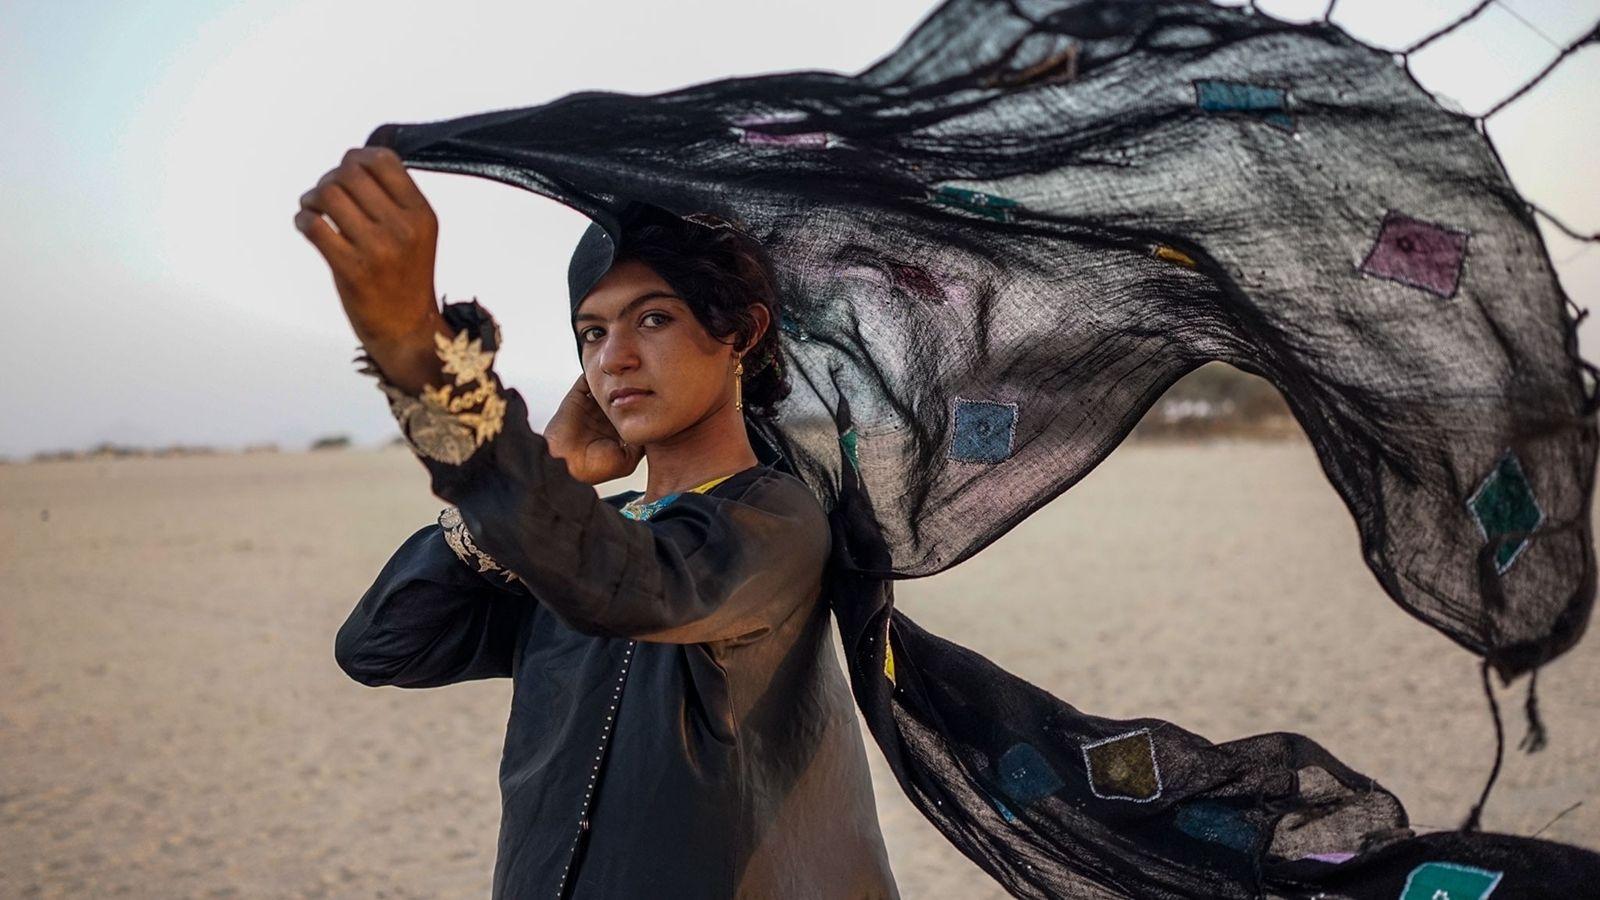 Una joven yemení